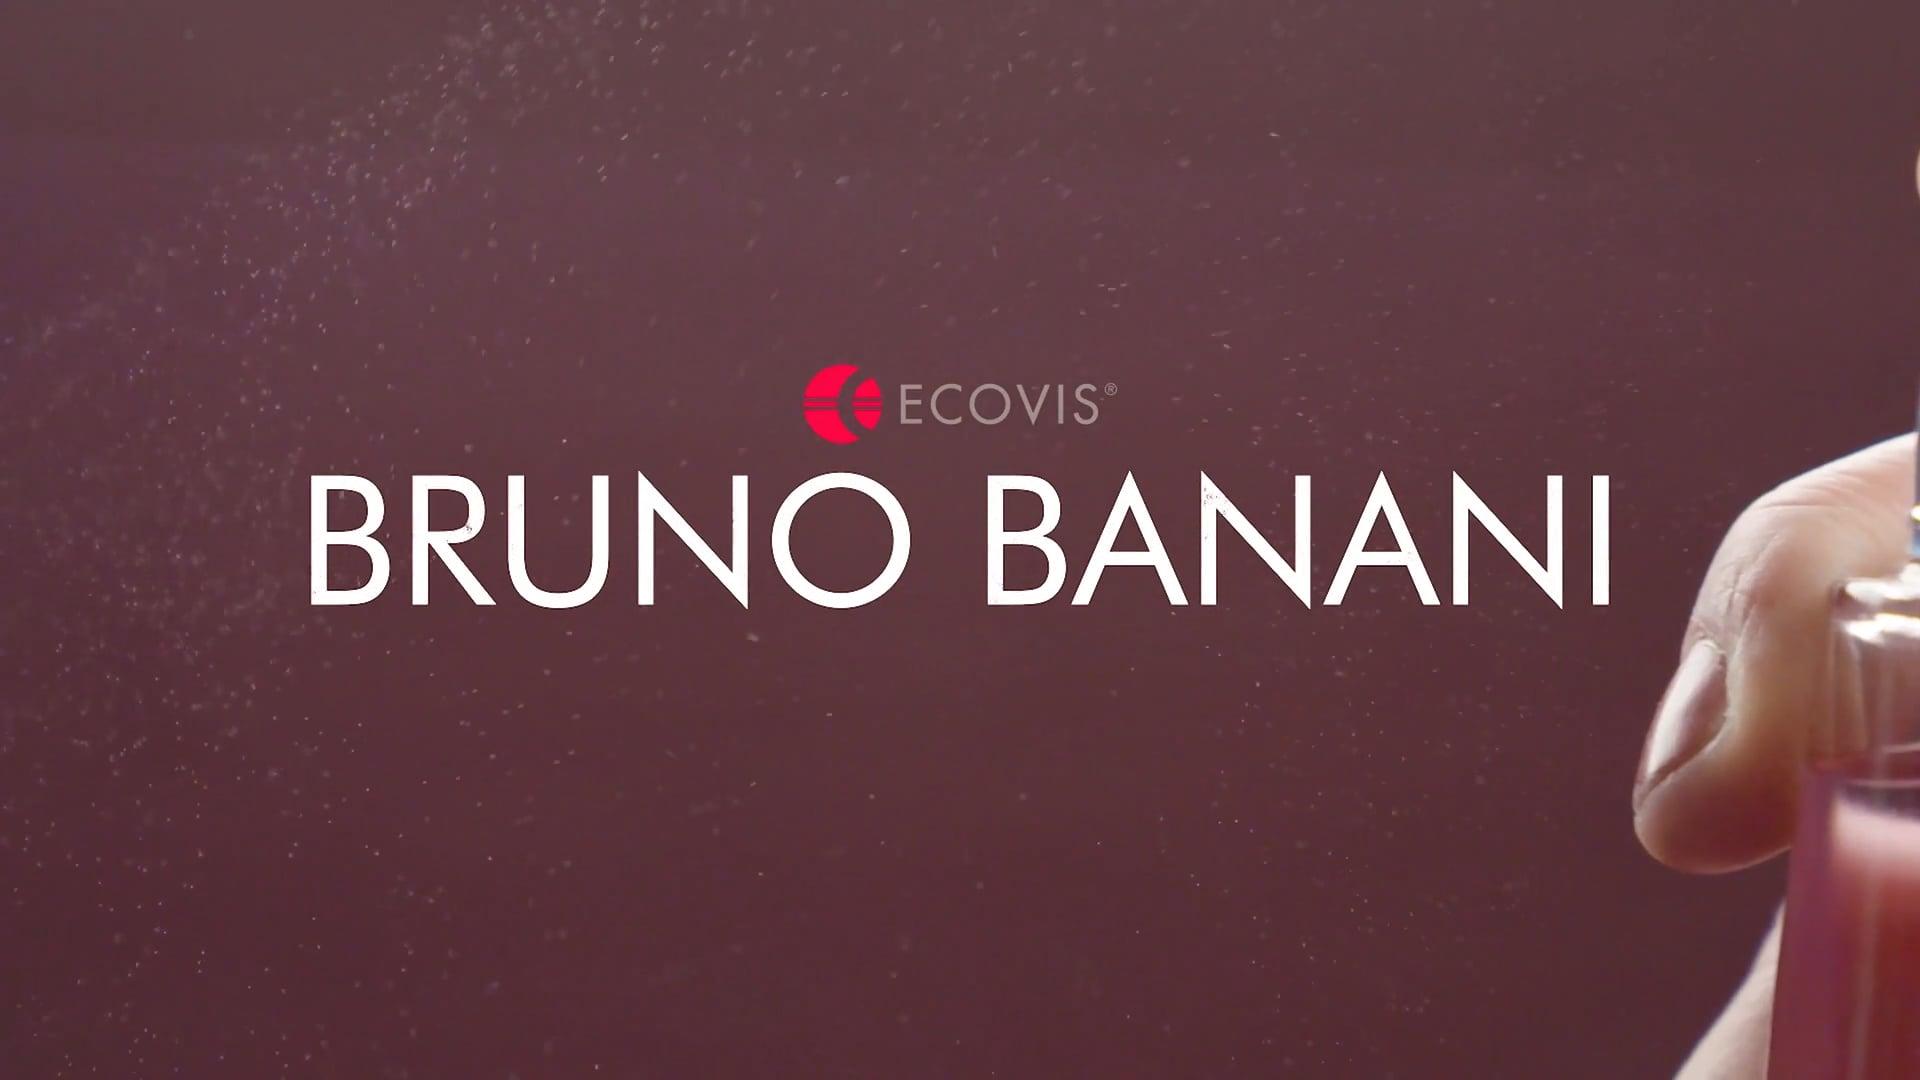 Ecovis - Bruno Banani